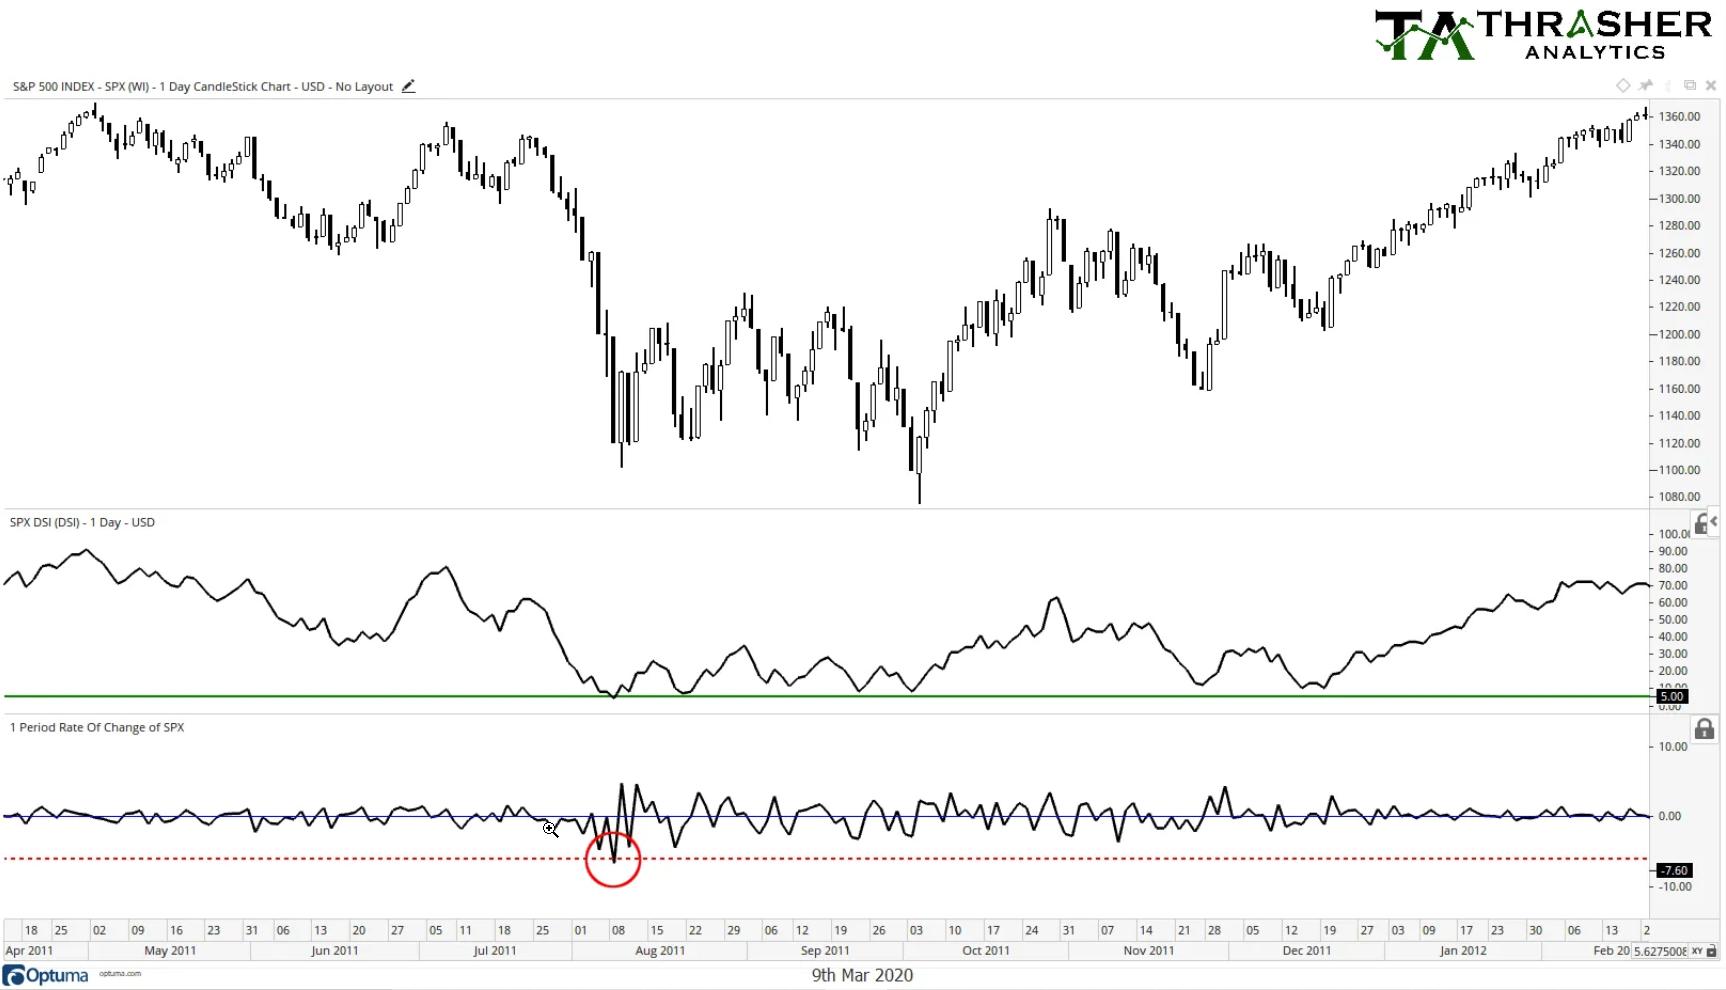 S&P 500: 2011